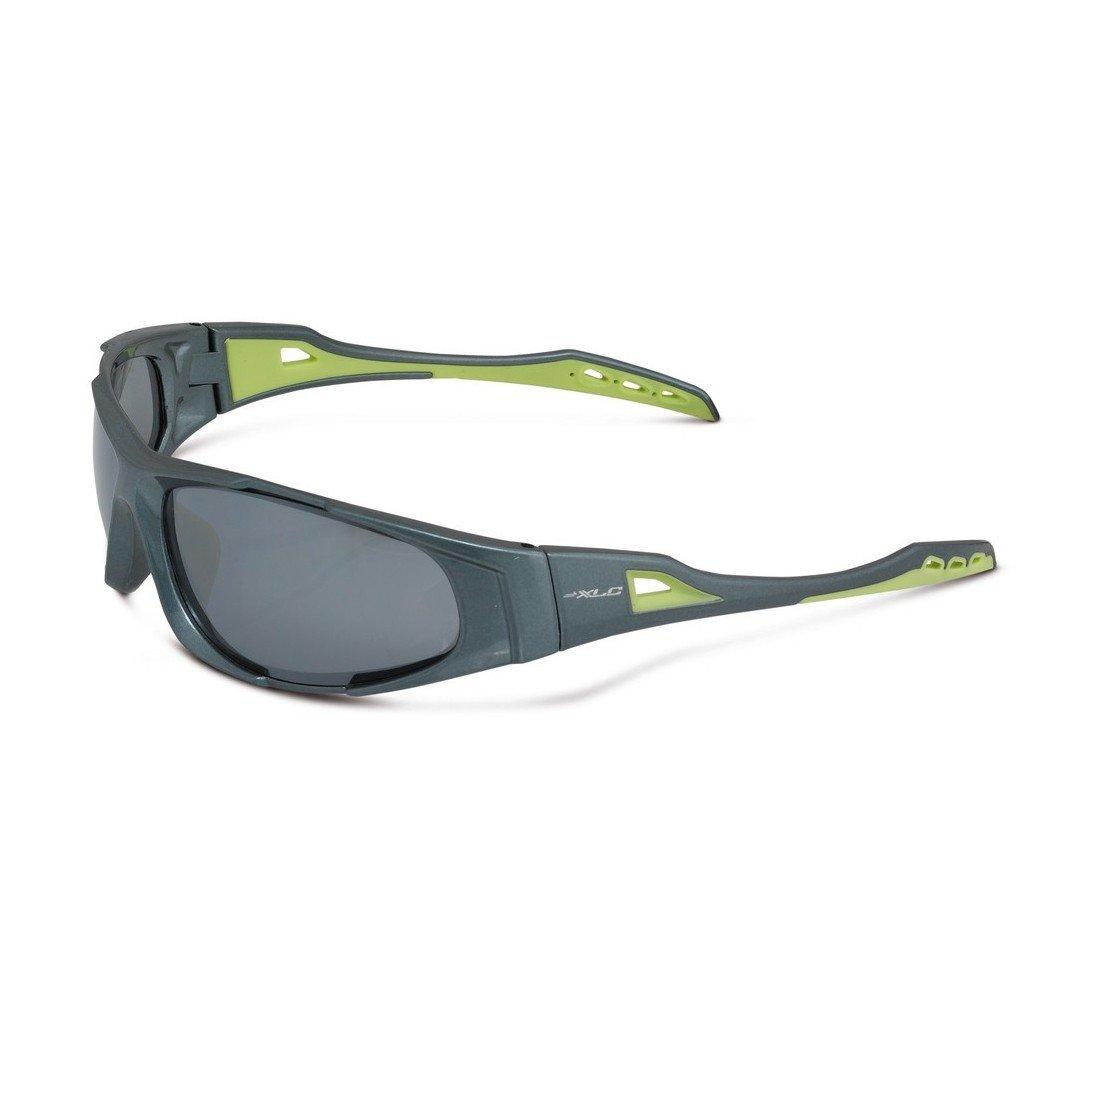 TALLA Talla única. XLC Gafas de Sol Sula wesi SG de C10